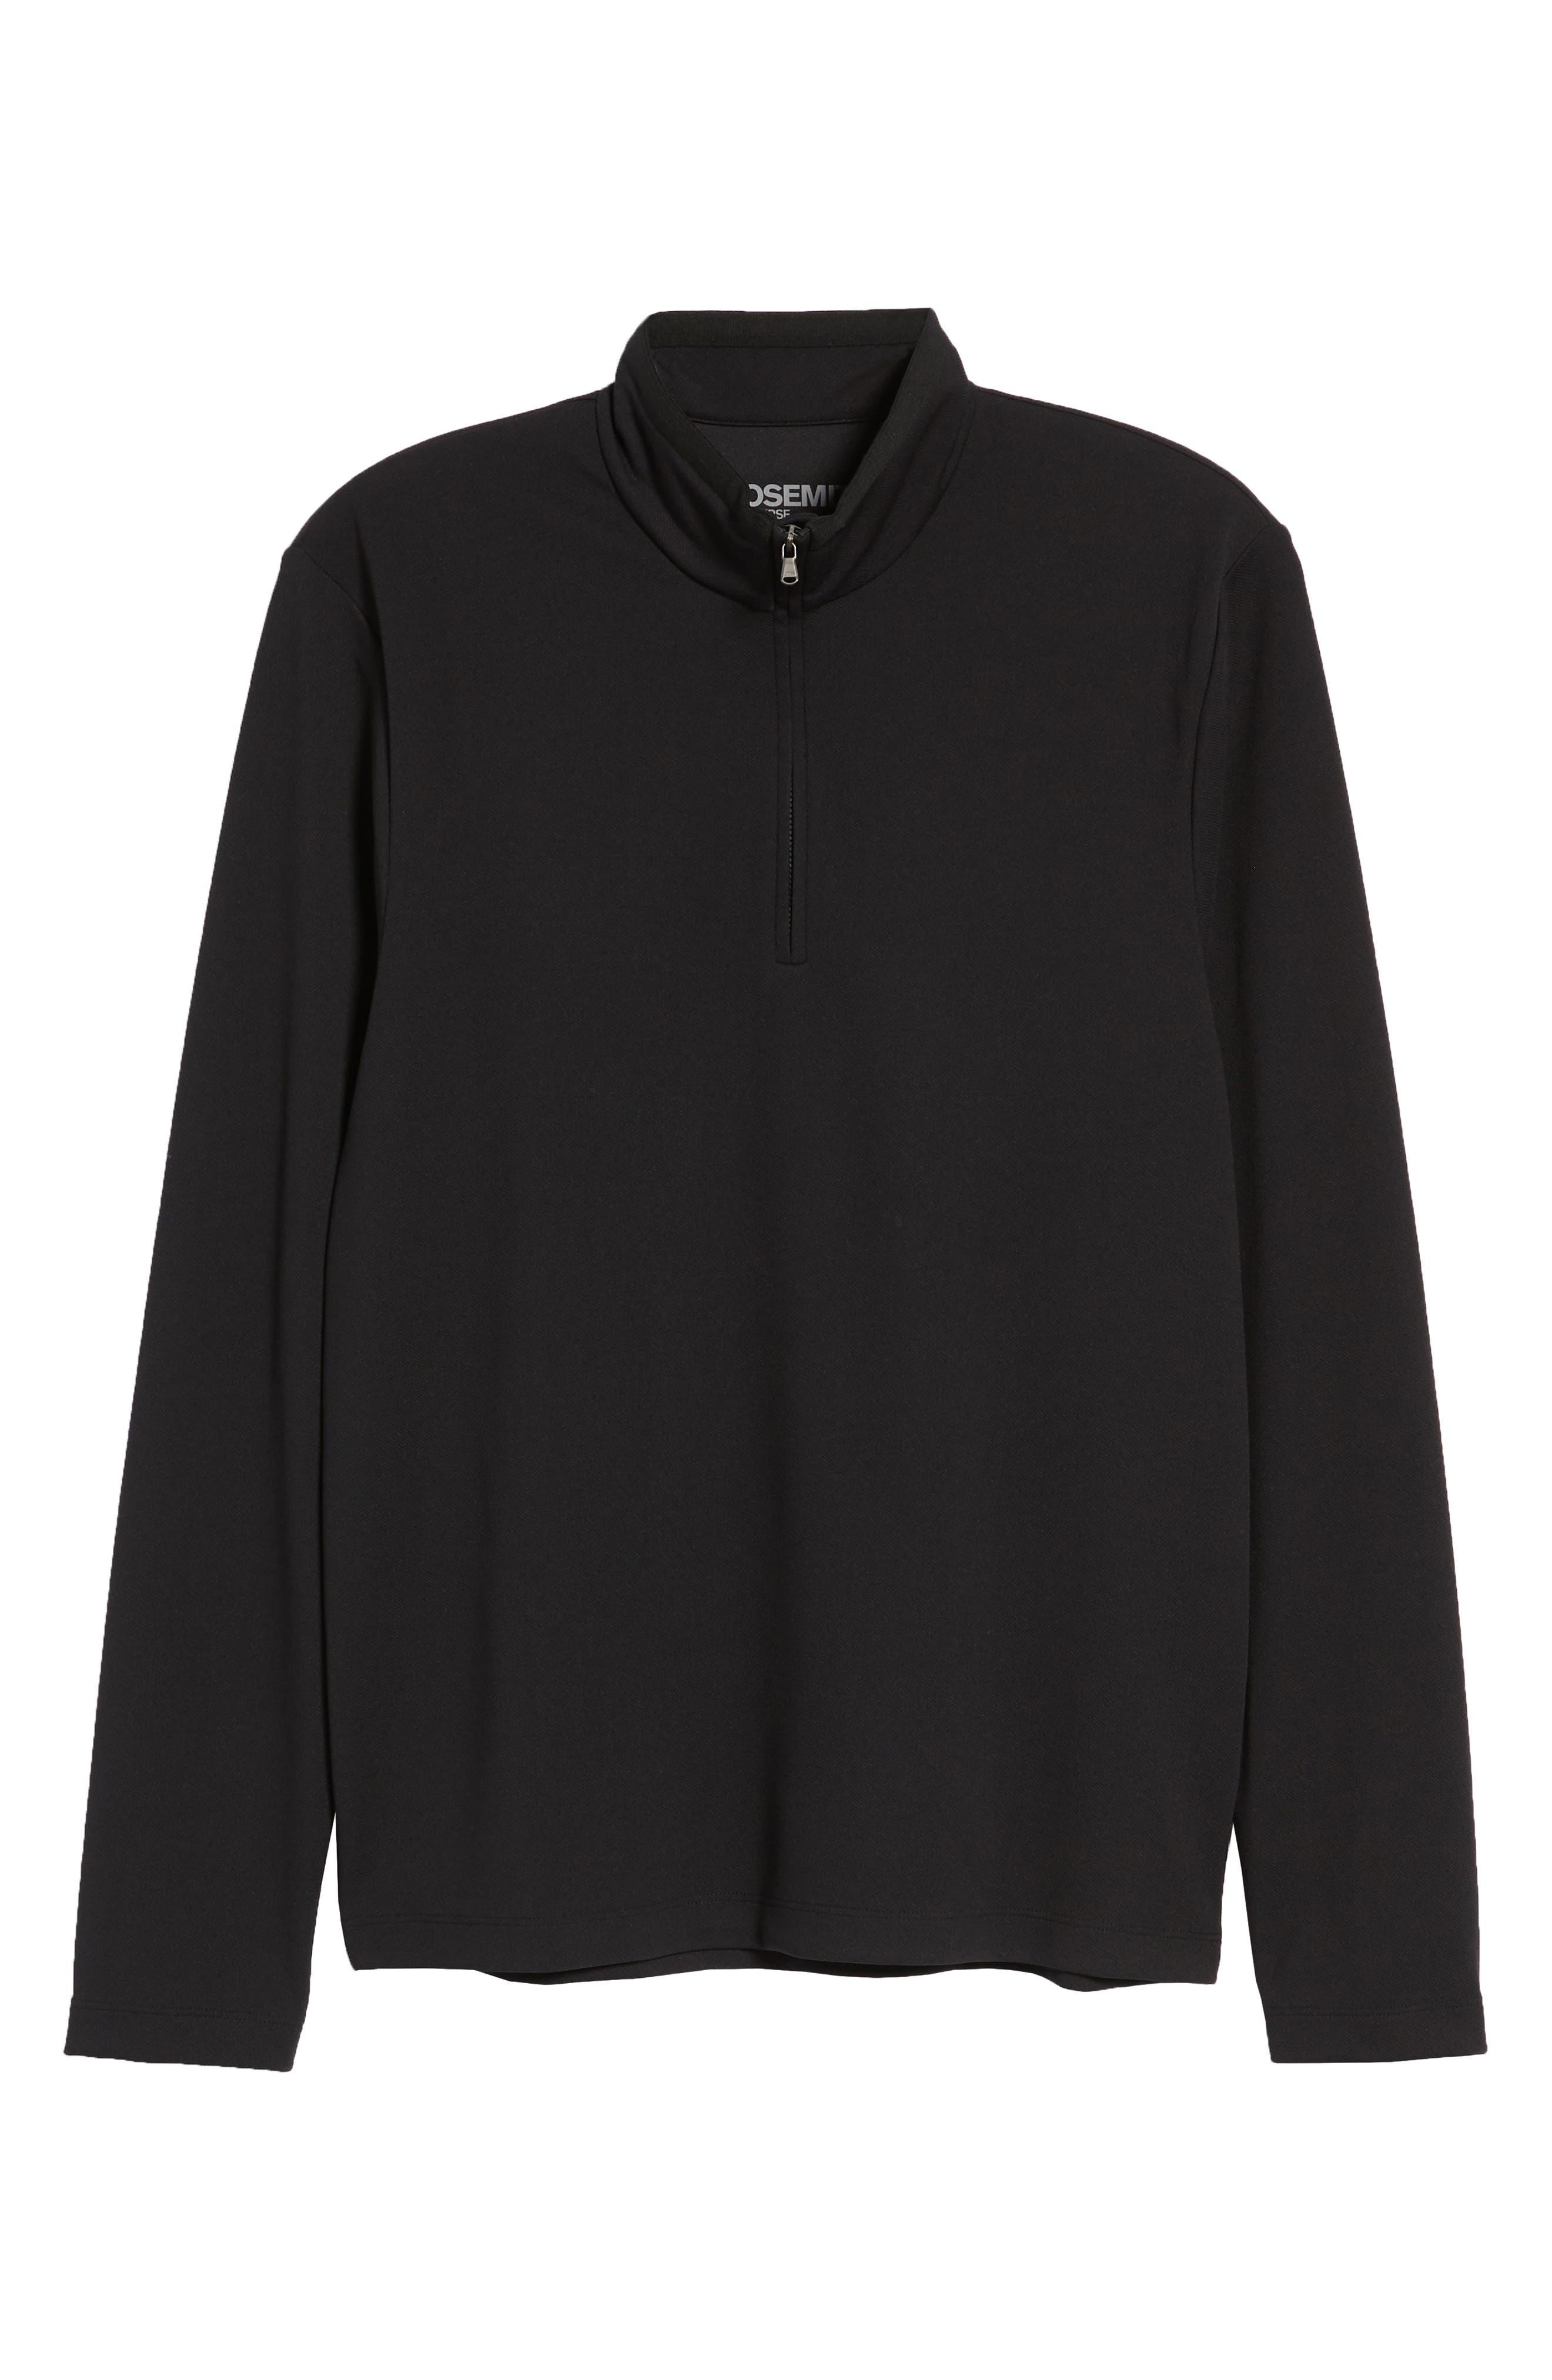 Performance Quarter Zip Pullover,                             Alternate thumbnail 6, color,                             Black/ Black